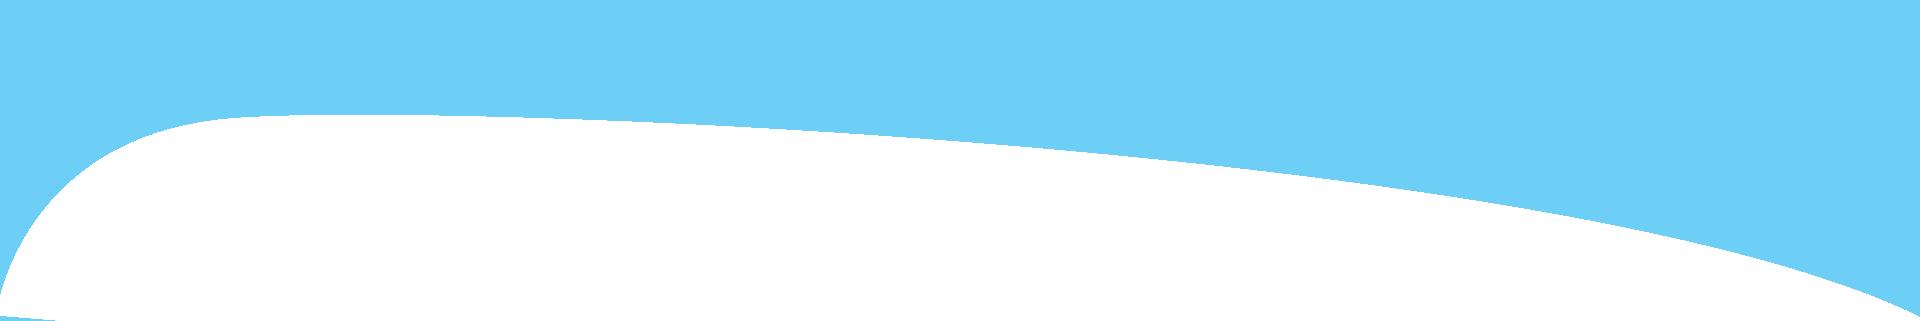 Barre bleue